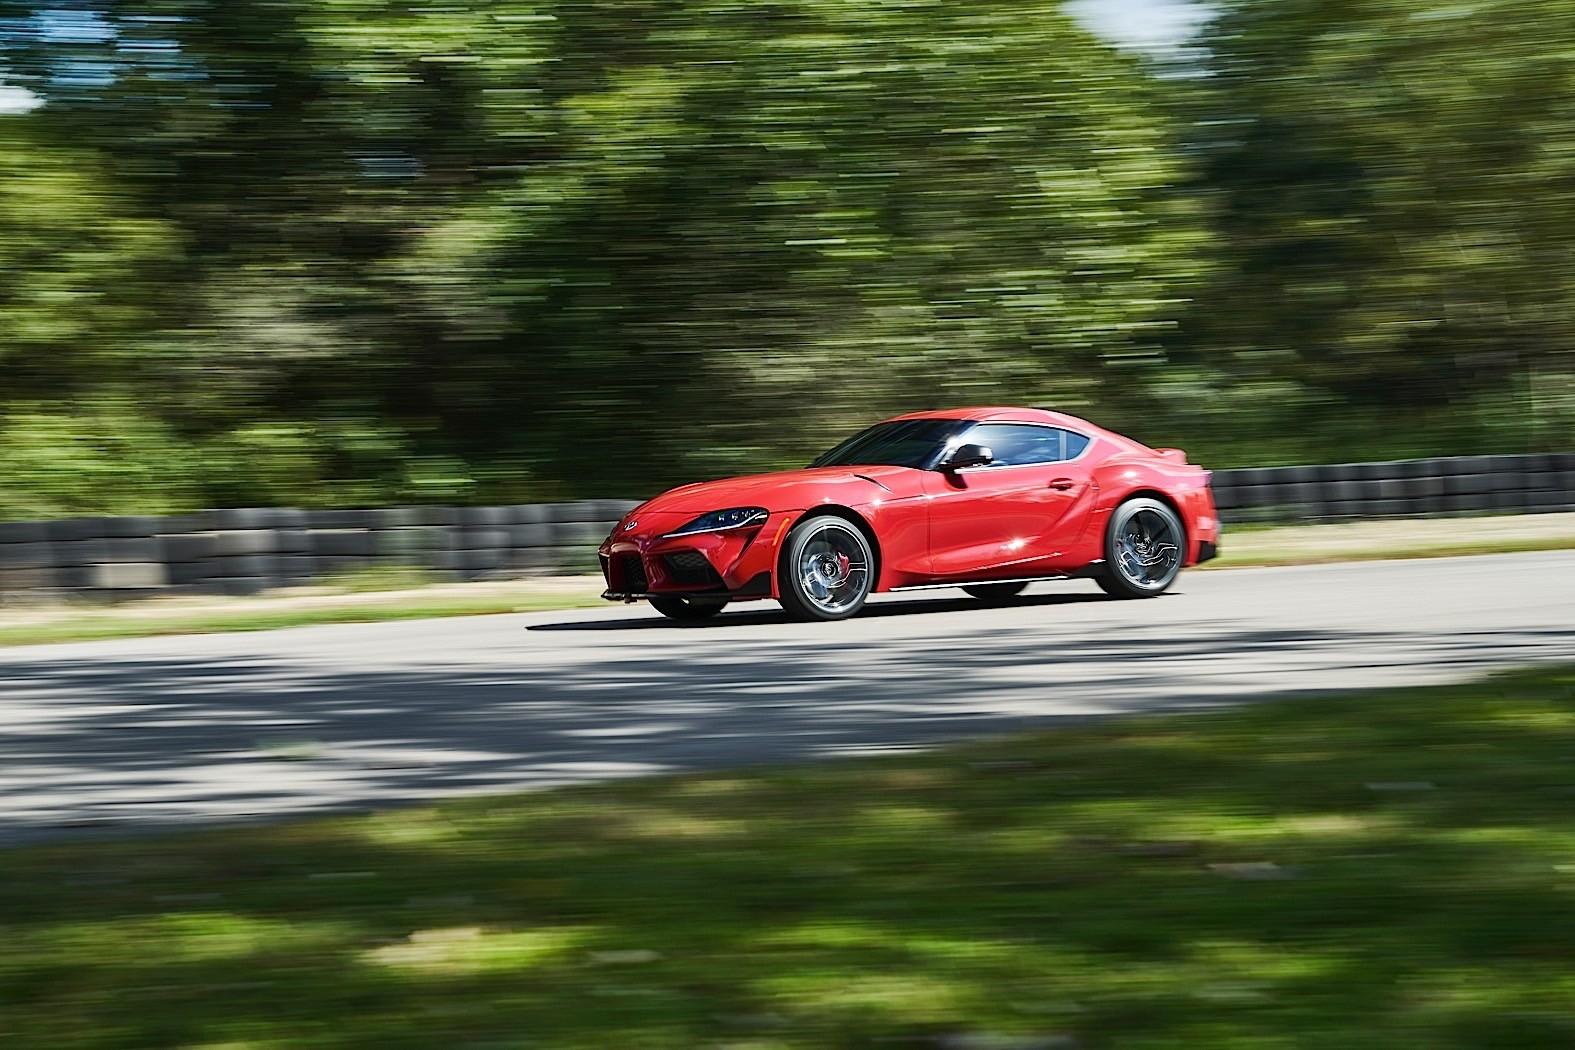 2020 Toyota Gr Supra Priced At 49 990 Autoevolution